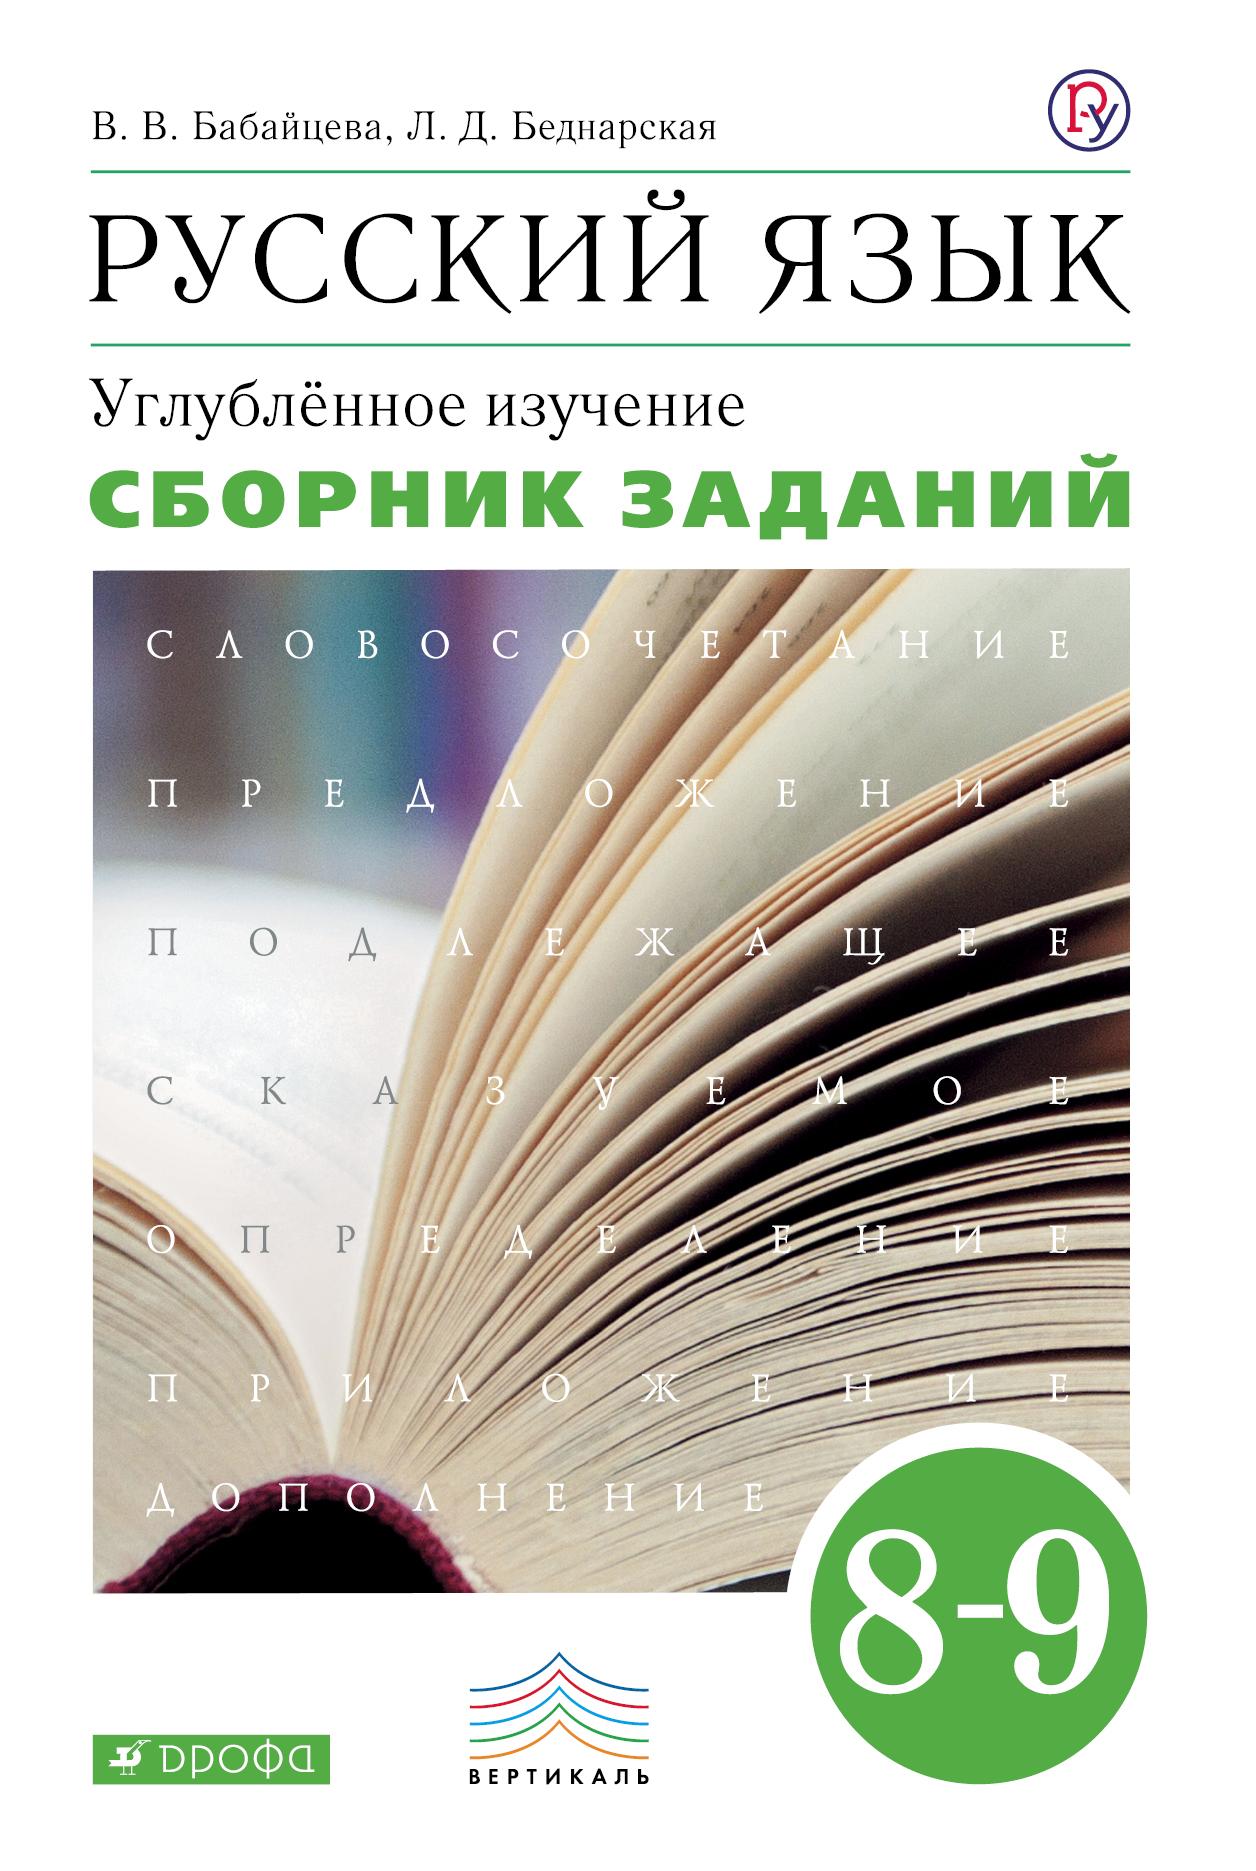 Бабайцева беднарская сборник заданий 6-7 класс гдз